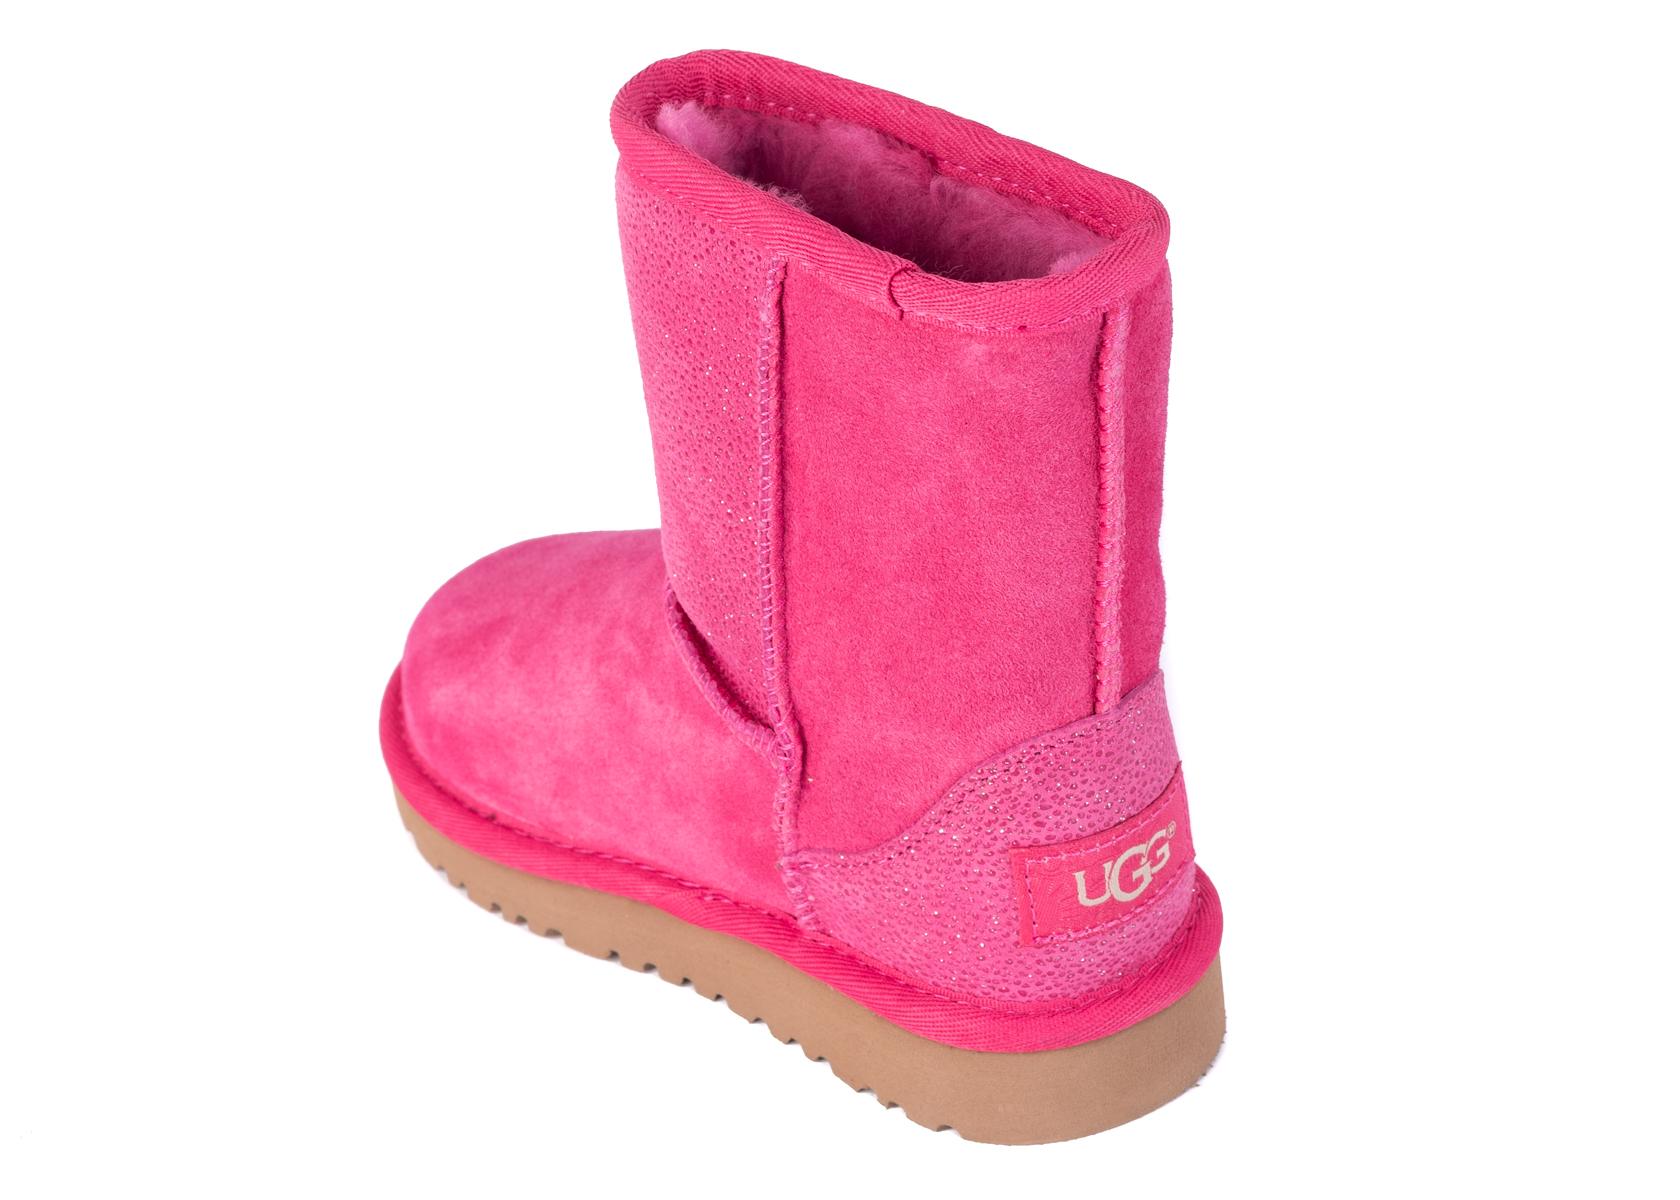 3f345f98fff UGG Toddler Girls Classic Short Serein Pink Glitter Boots Size US9 ...